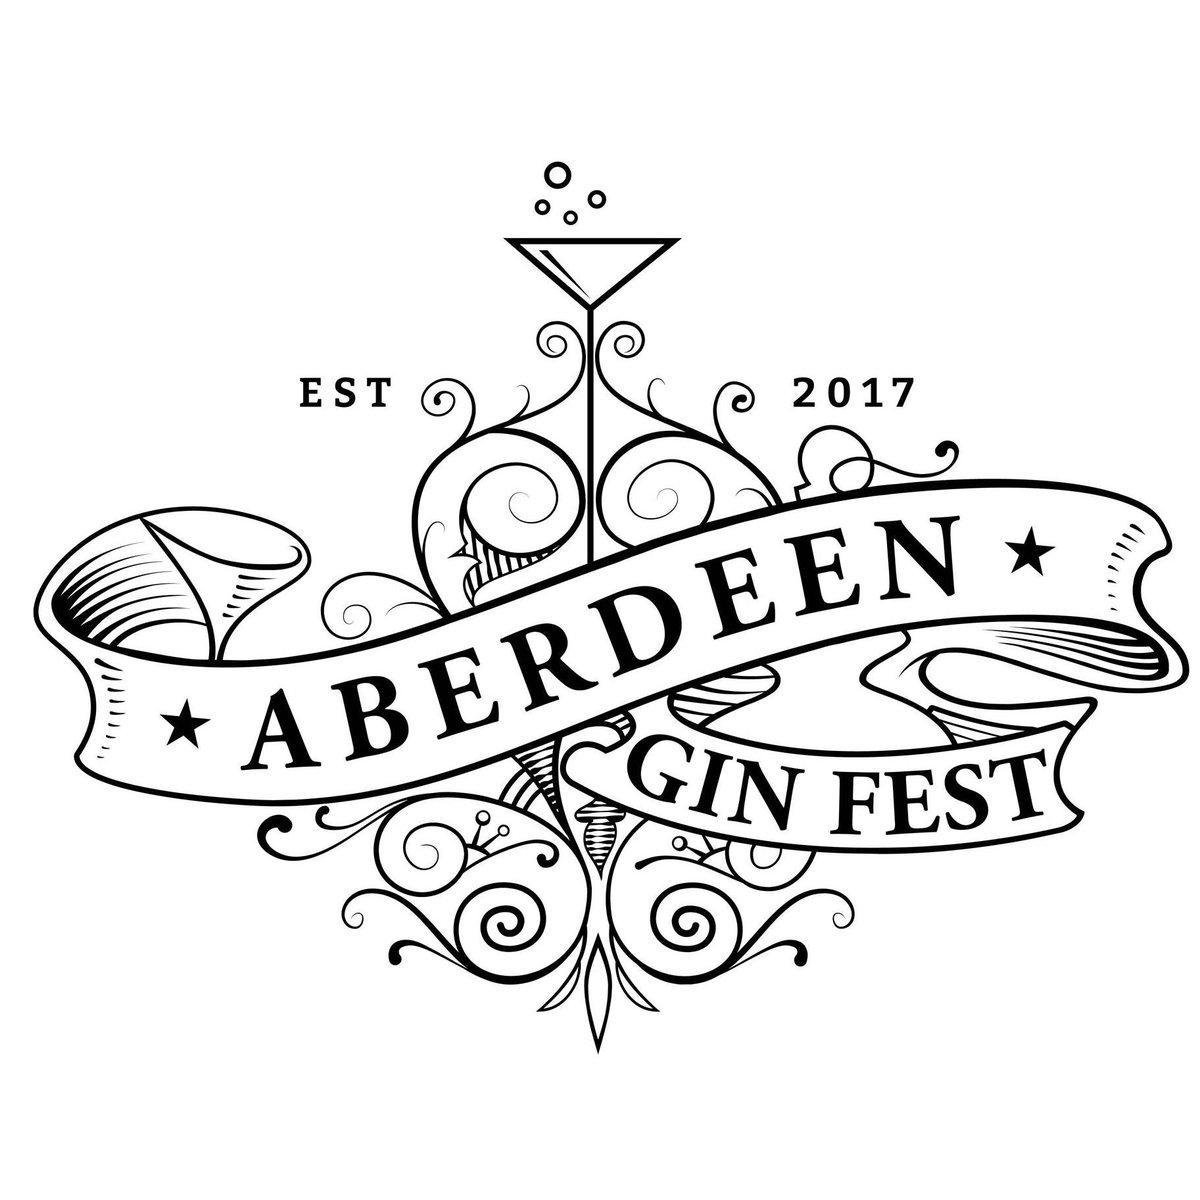 aberdeenginfest hashtag on Twitter.